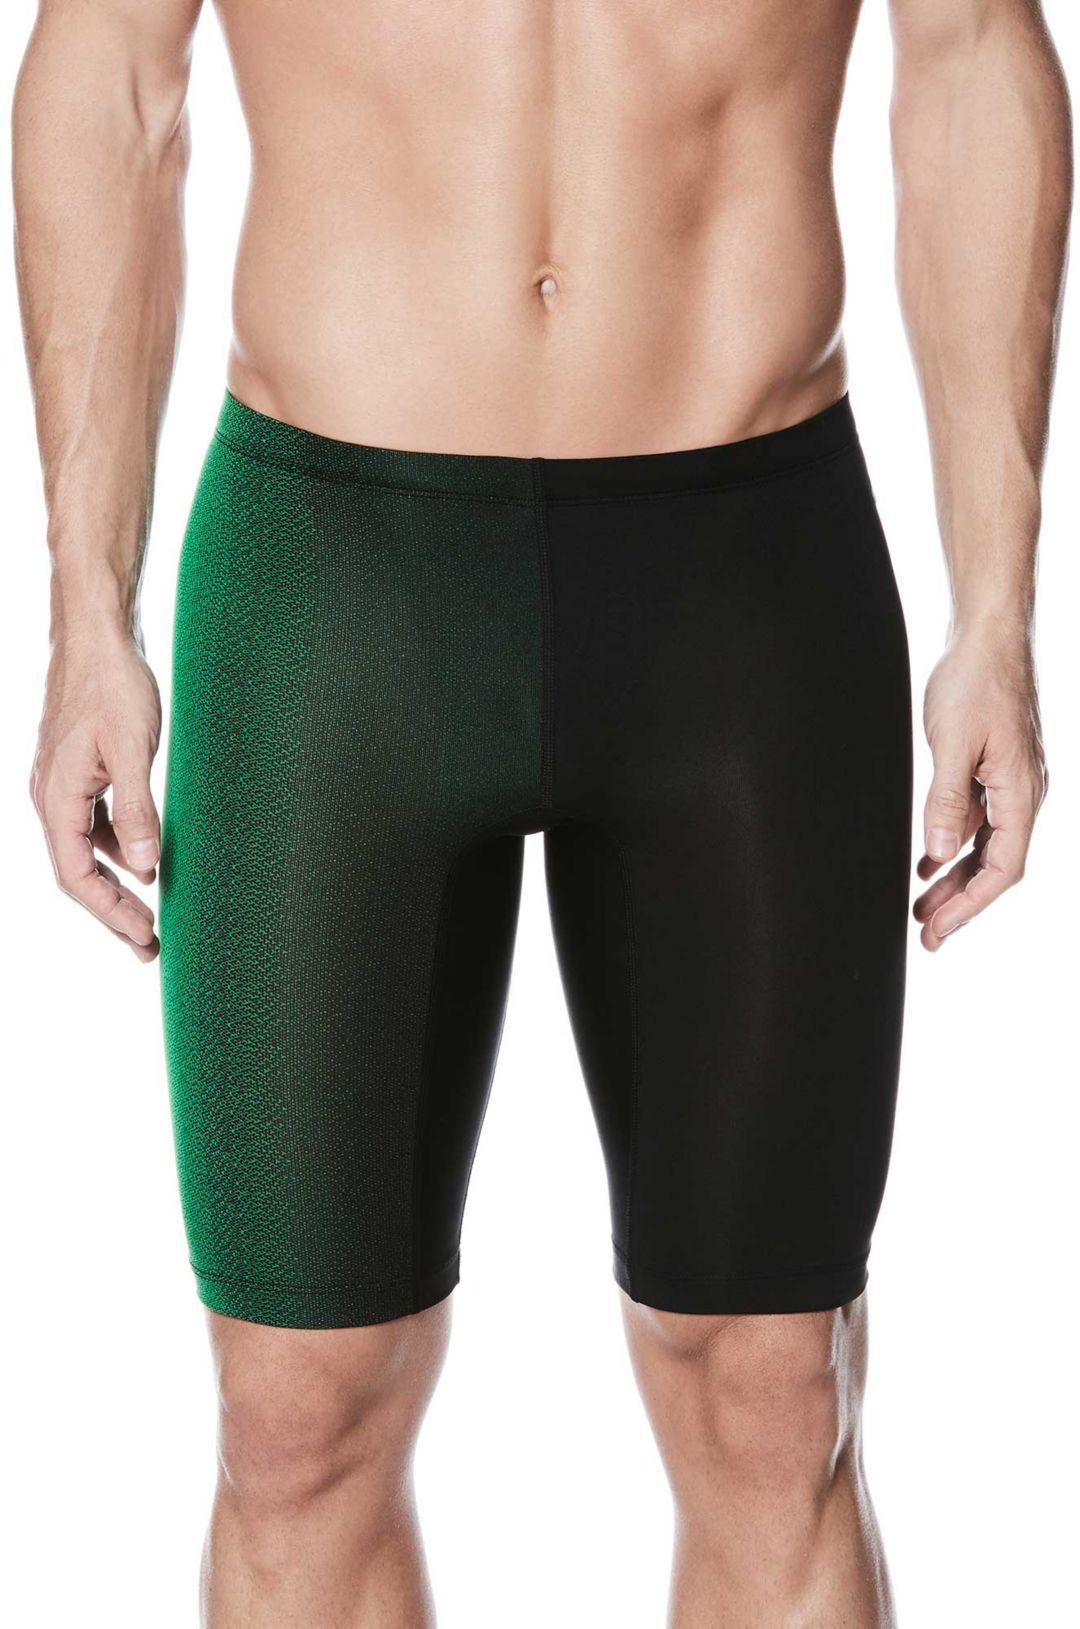 775cf62919 Nike Men's Fade Sting Jammer | DICK'S Sporting Goods